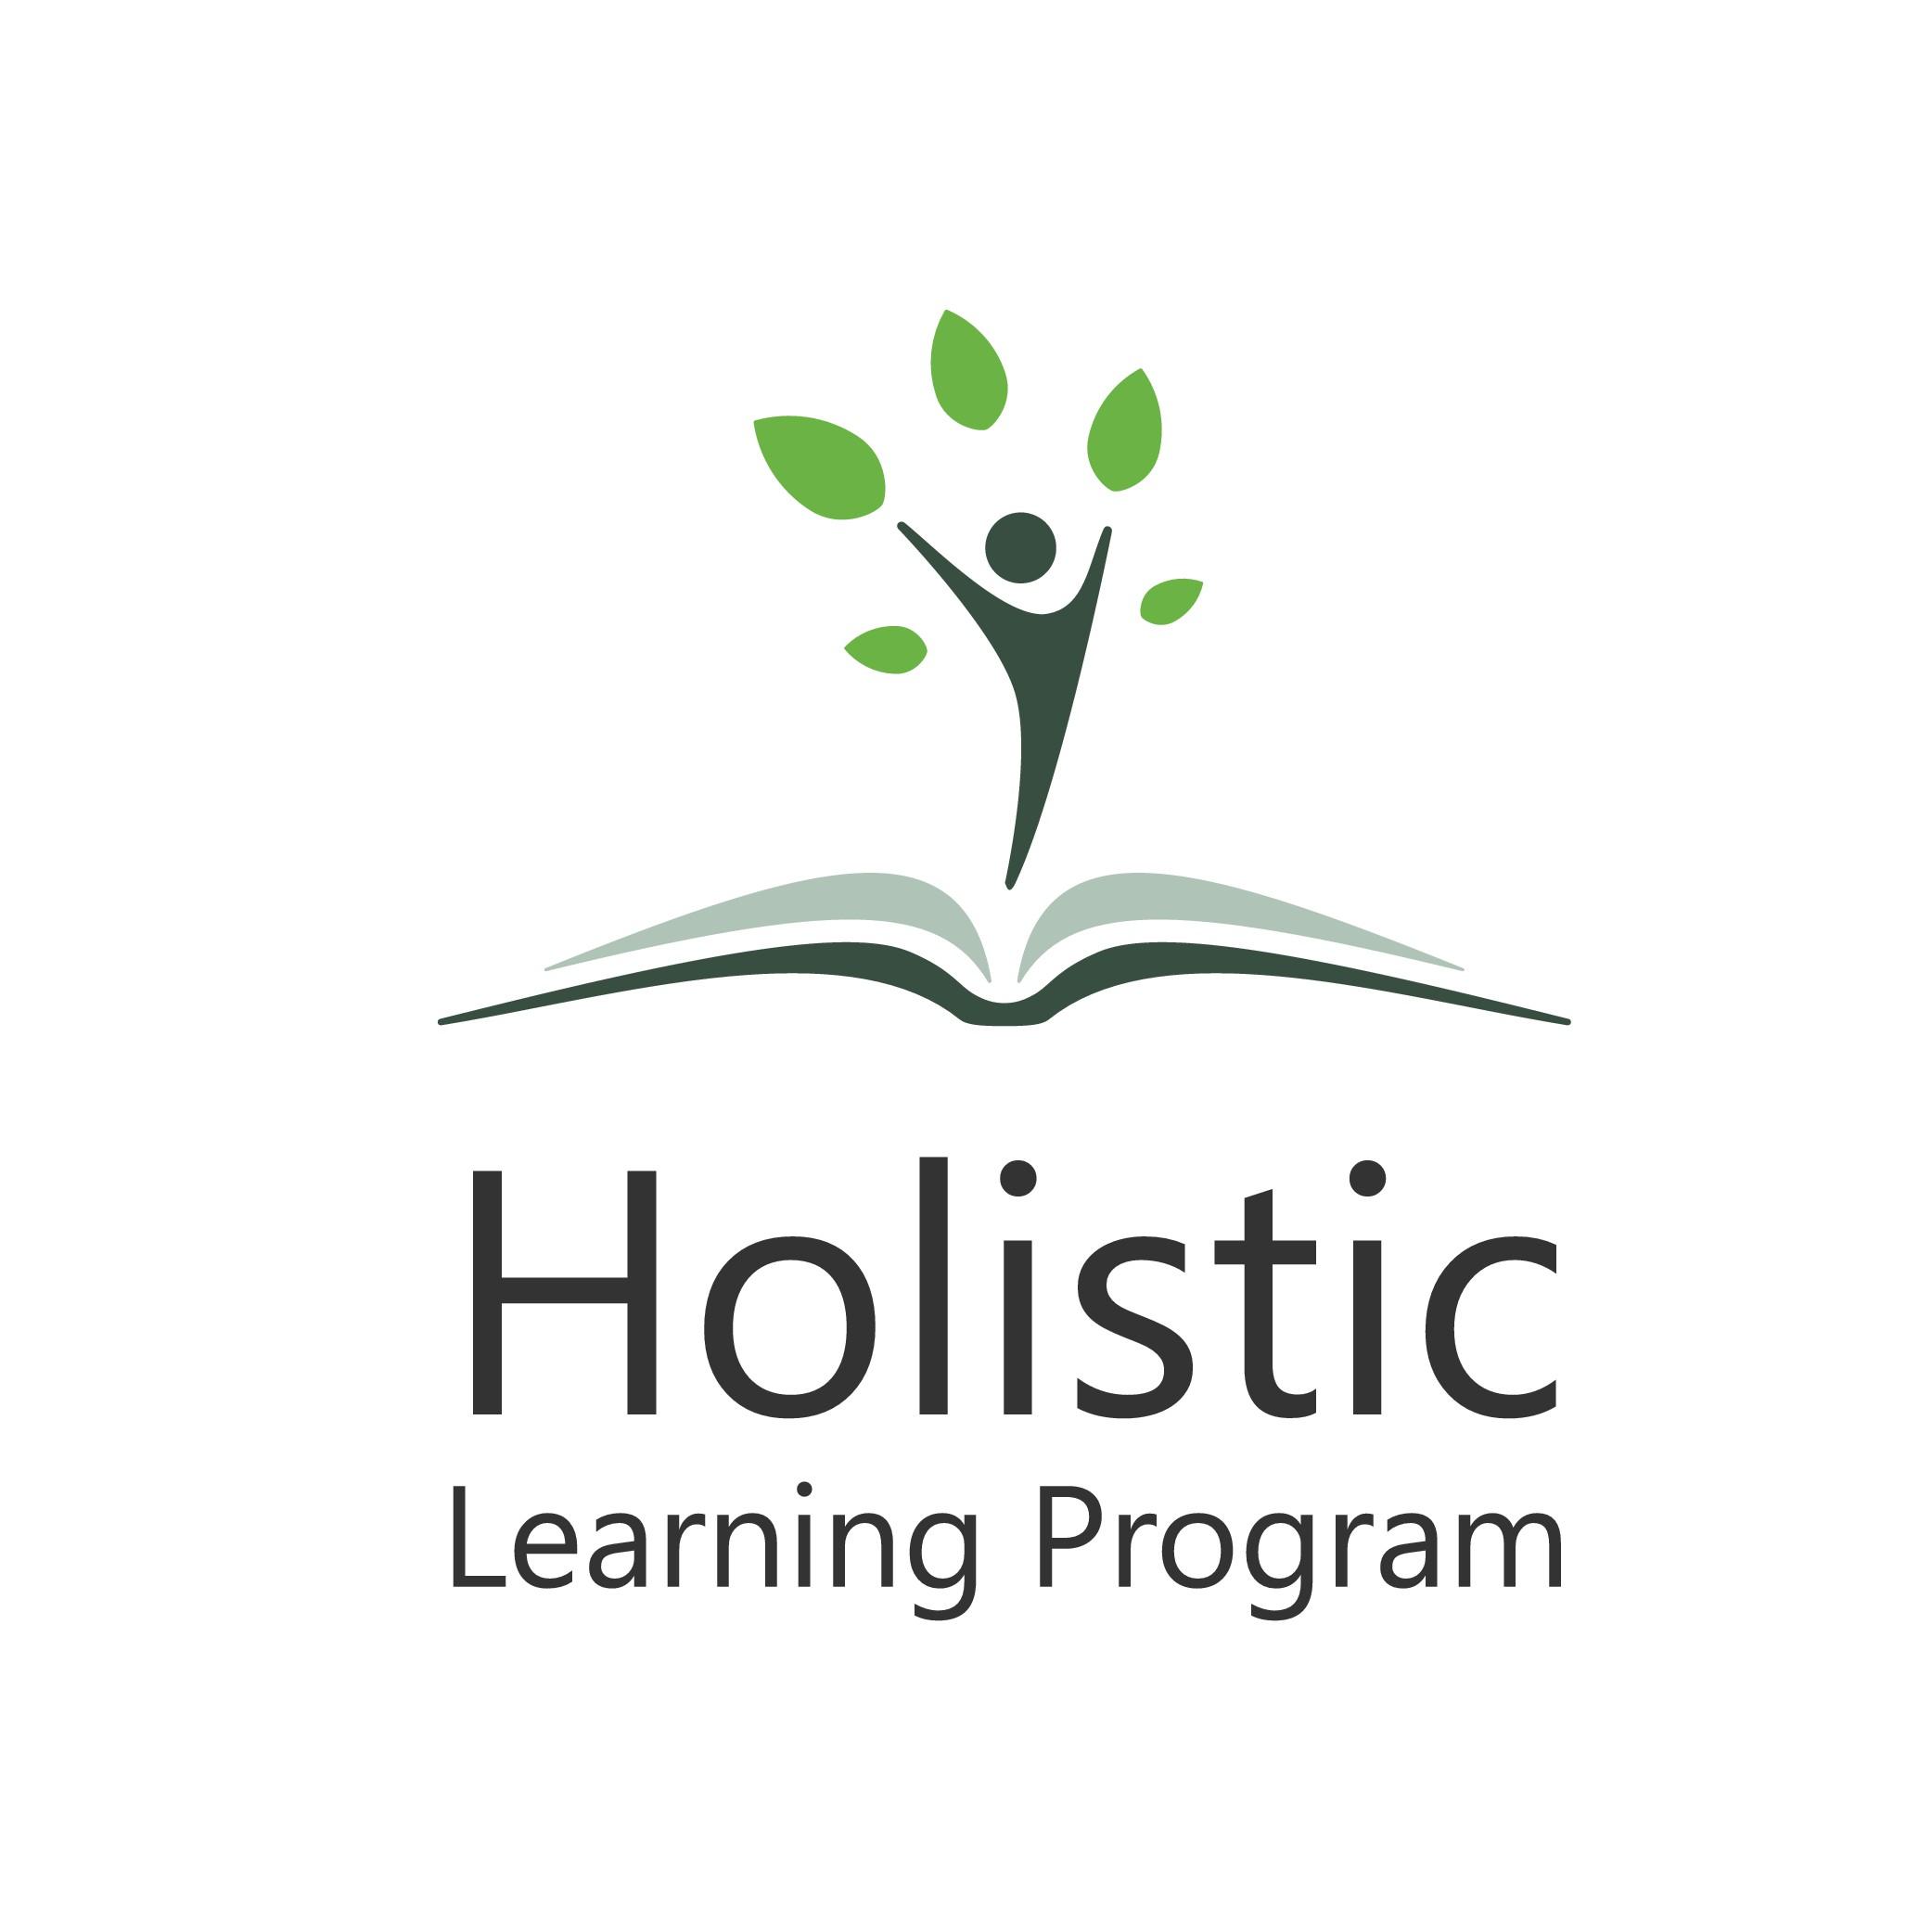 Innovative academic coaching program needs organic, nurturing, welcoming logo